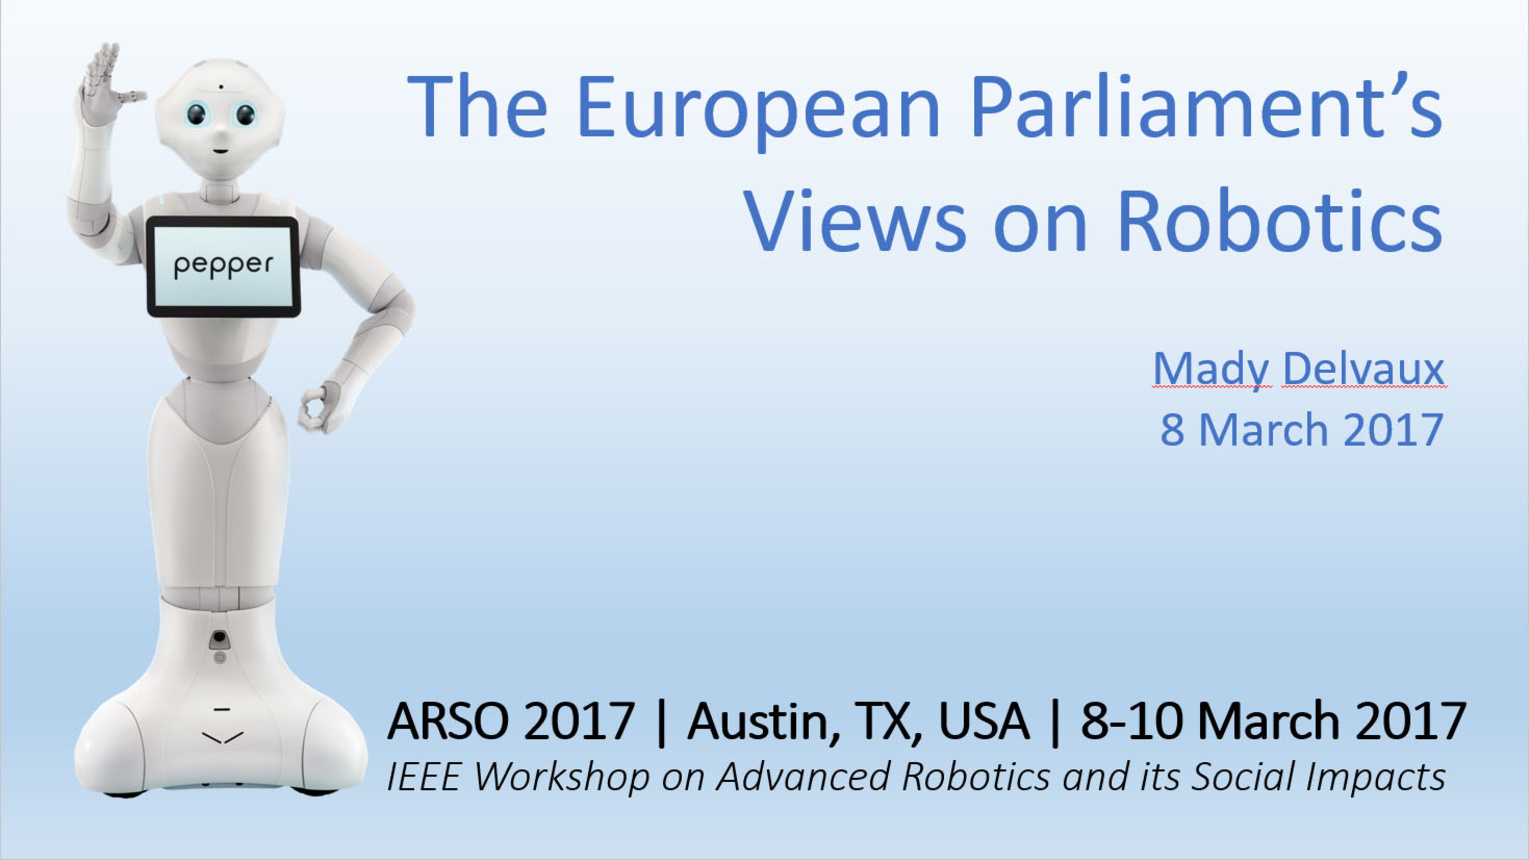 European Parliament Regulatory Efforts on Robotics